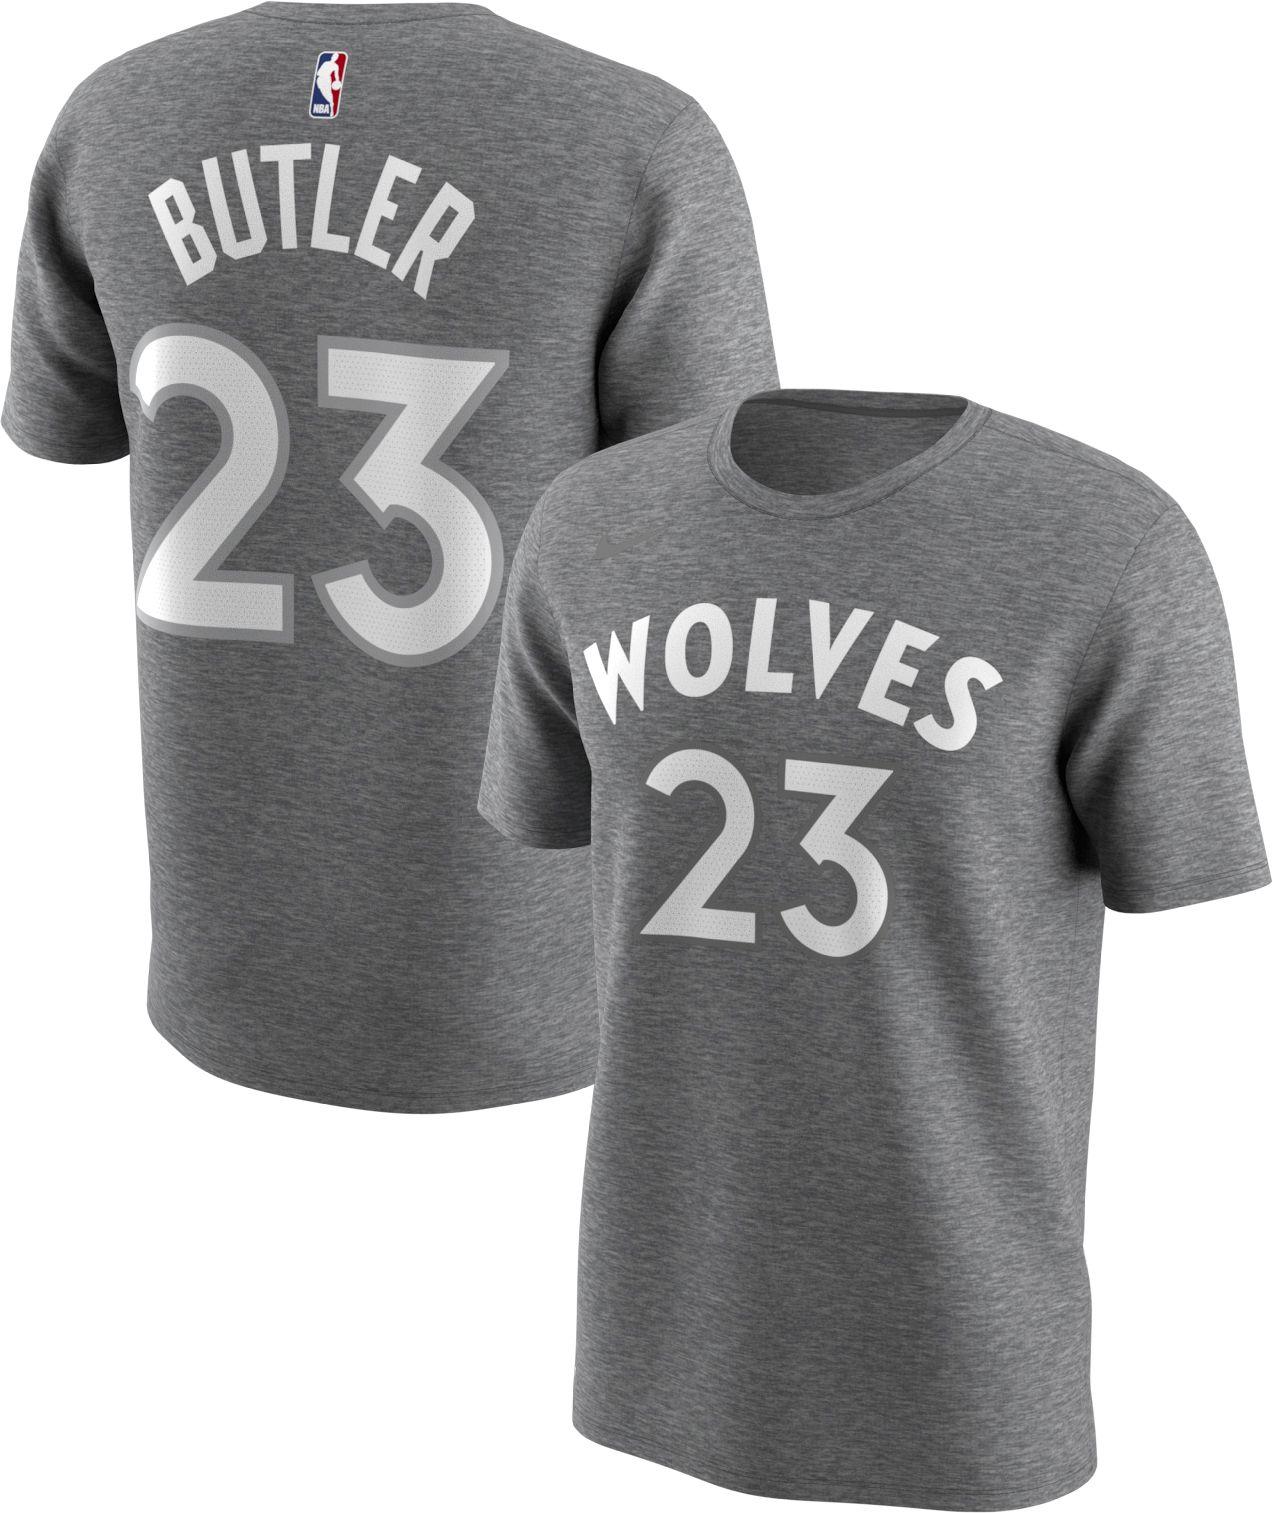 the best attitude bec22 8b8f2 australia jimmy butler jersey shirt ed7f0 170ac